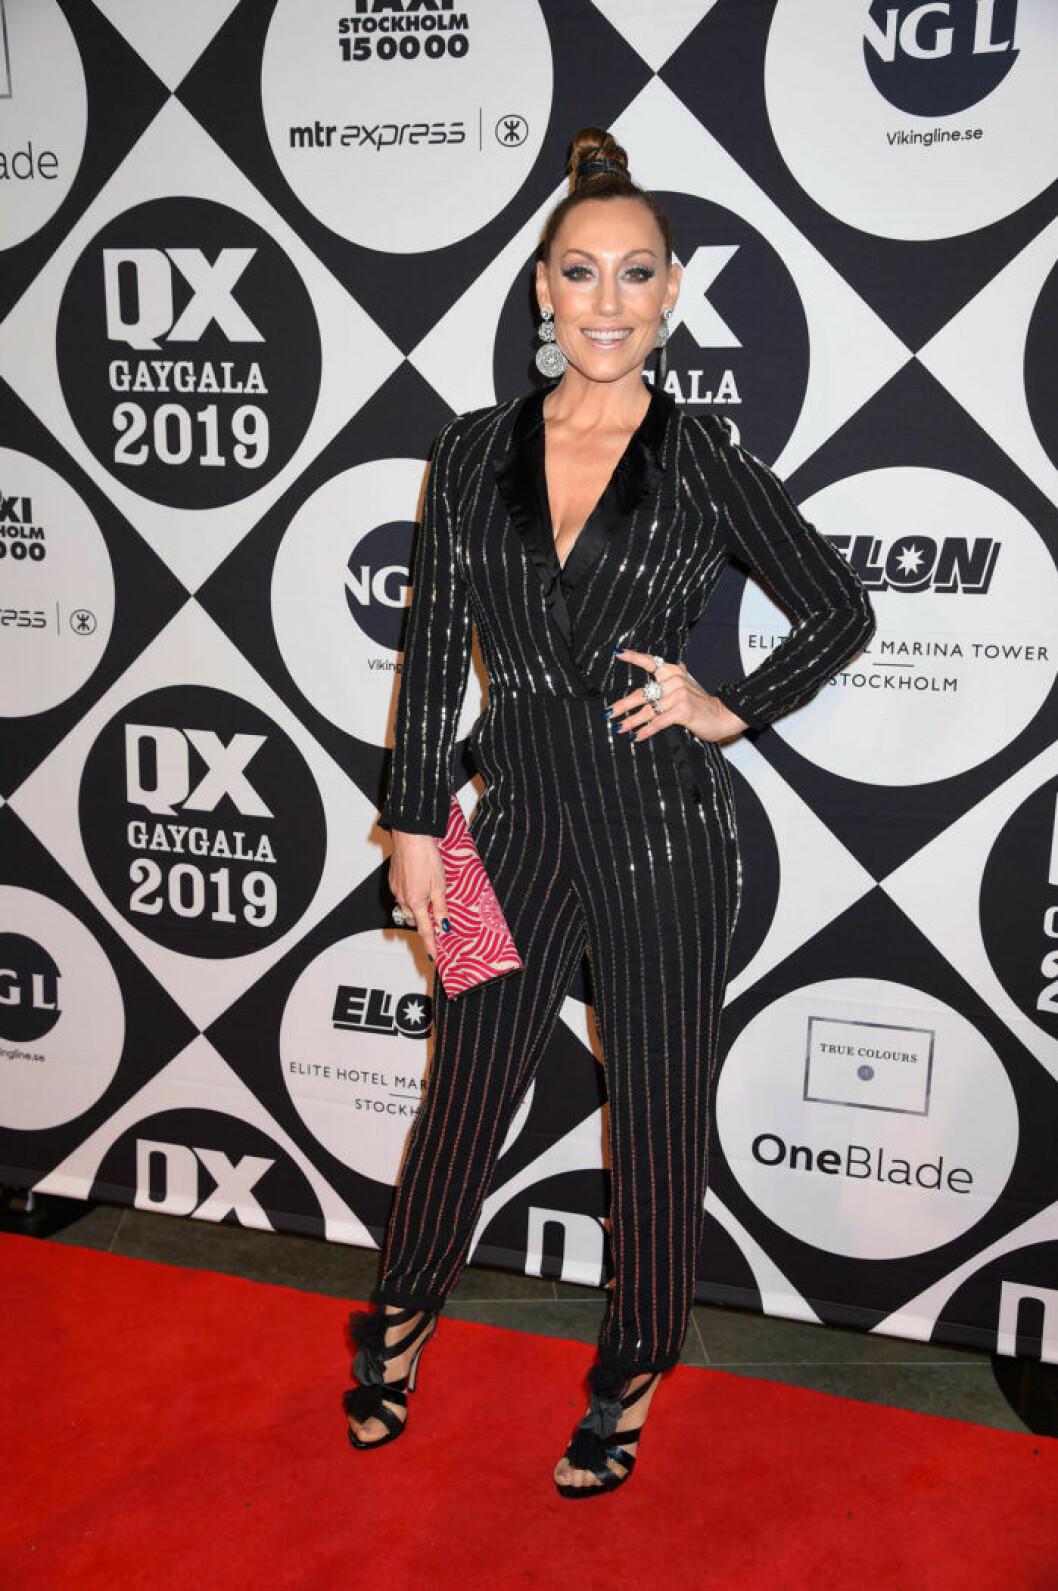 Linda Hedlund på QX-galan 2019